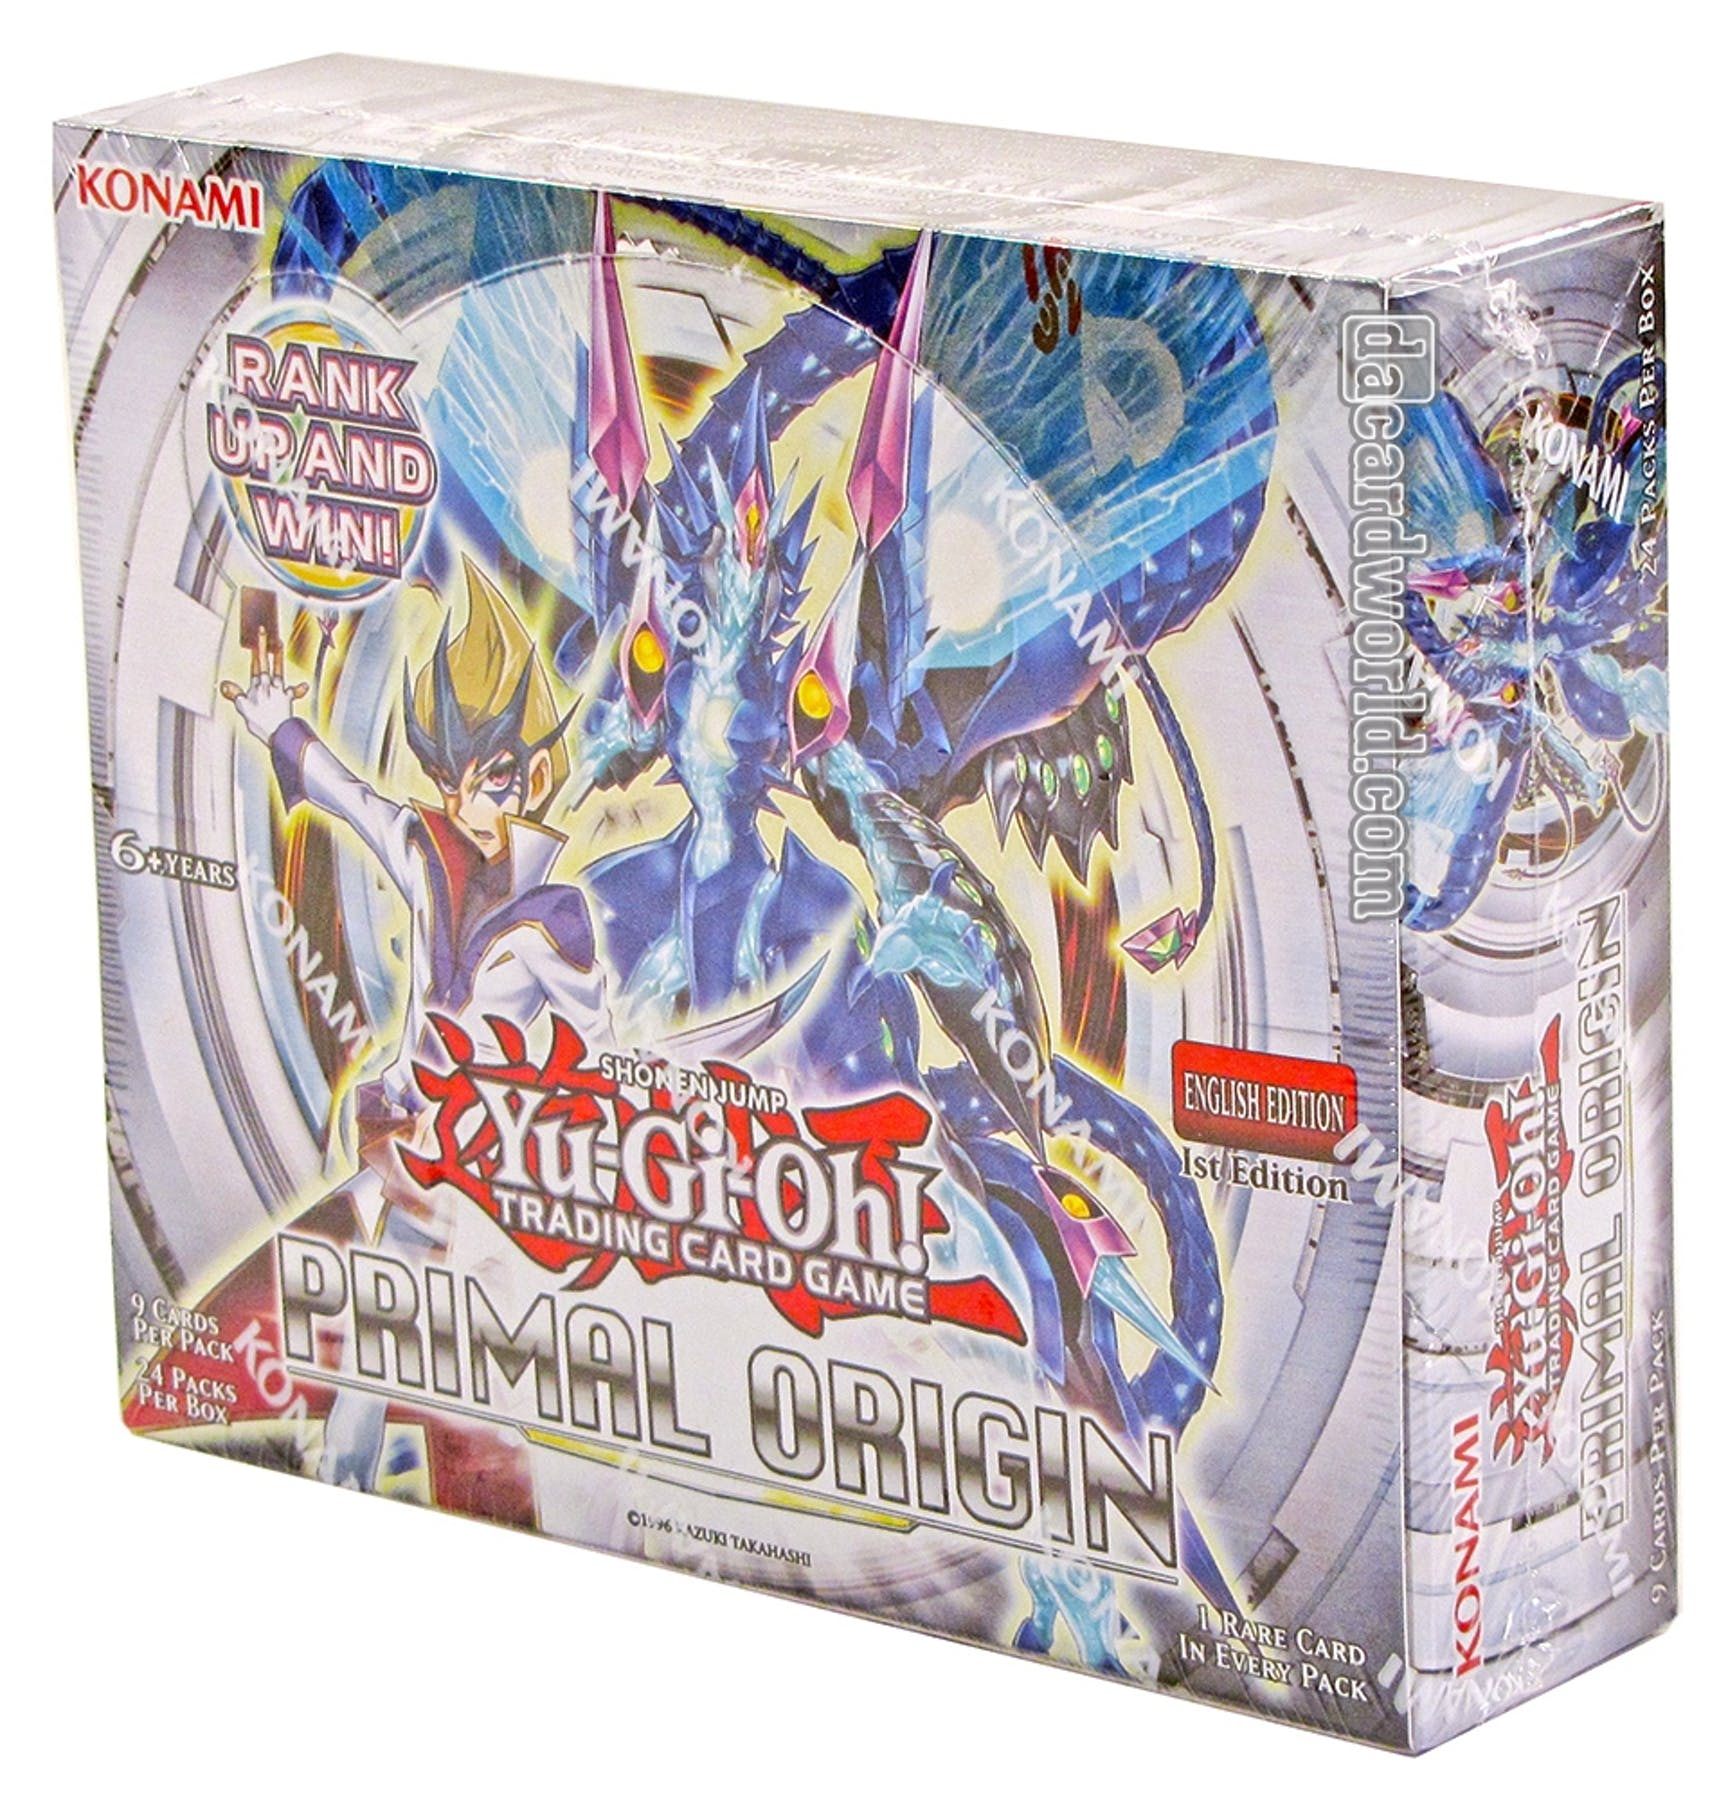 Yu-Gi-Oh Primal Origin 1st Edition Booster Box